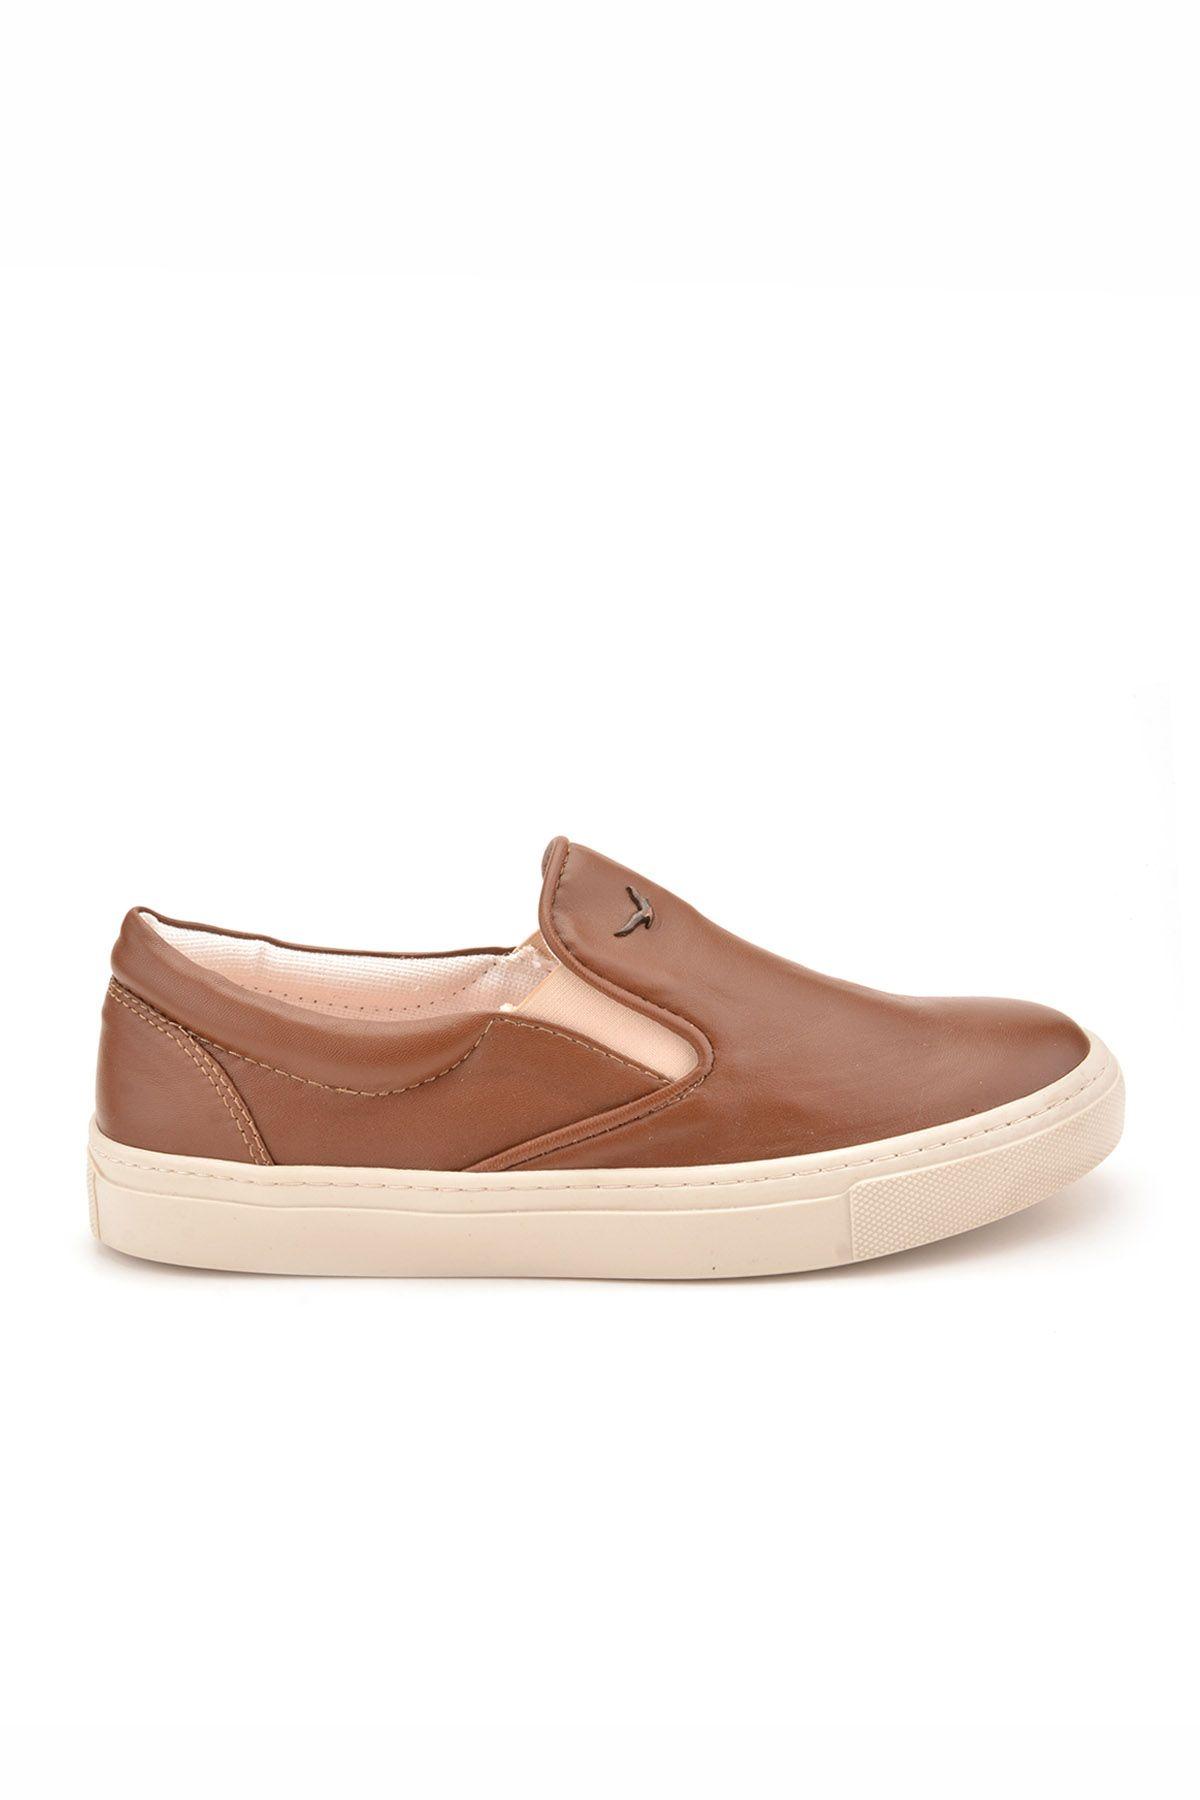 Art Goya Women Sneakers From Genuine Leather Brown